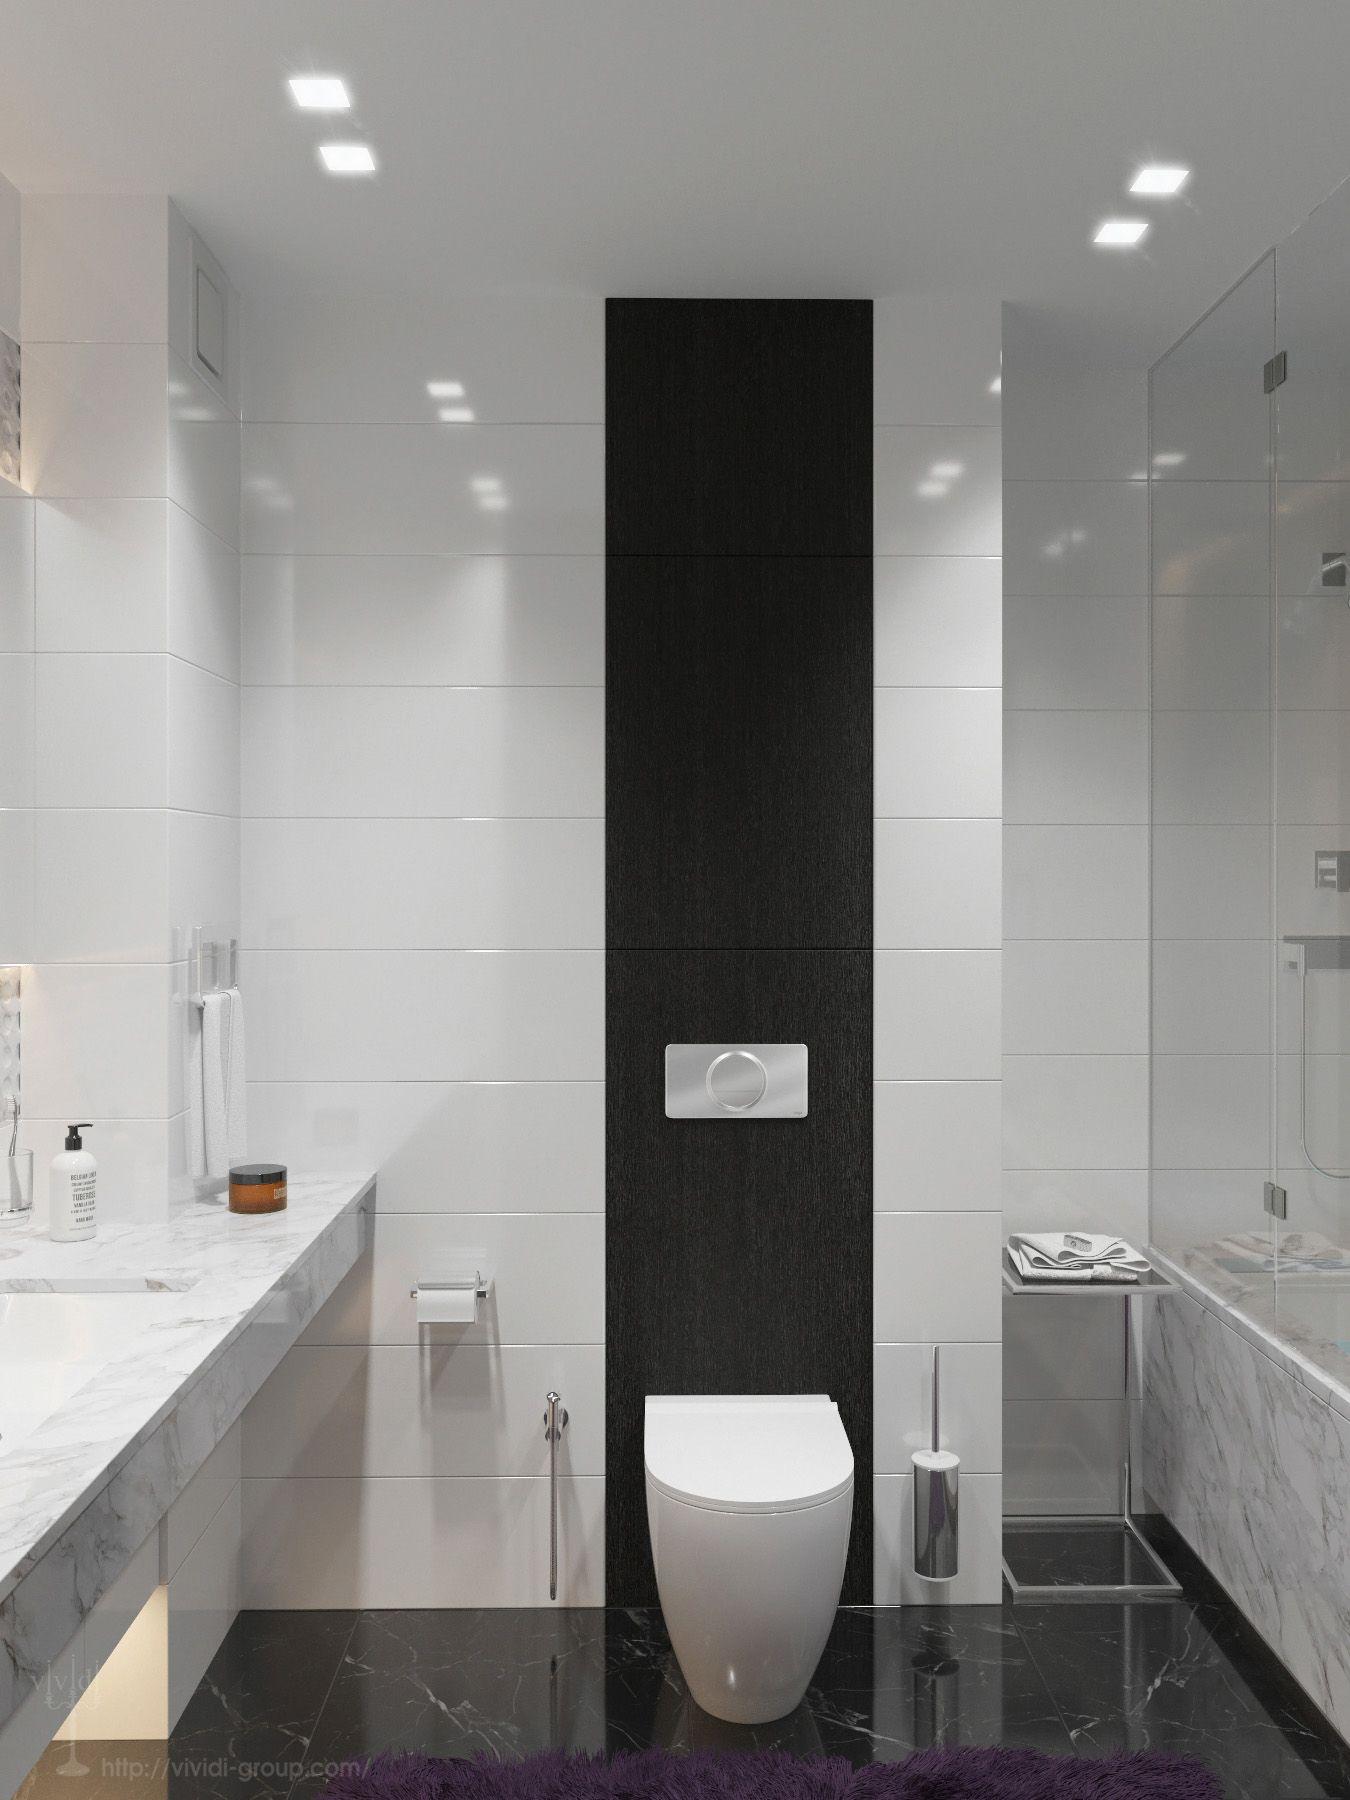 Contemporary bathroom / Rendering / Software: 3ds max ...